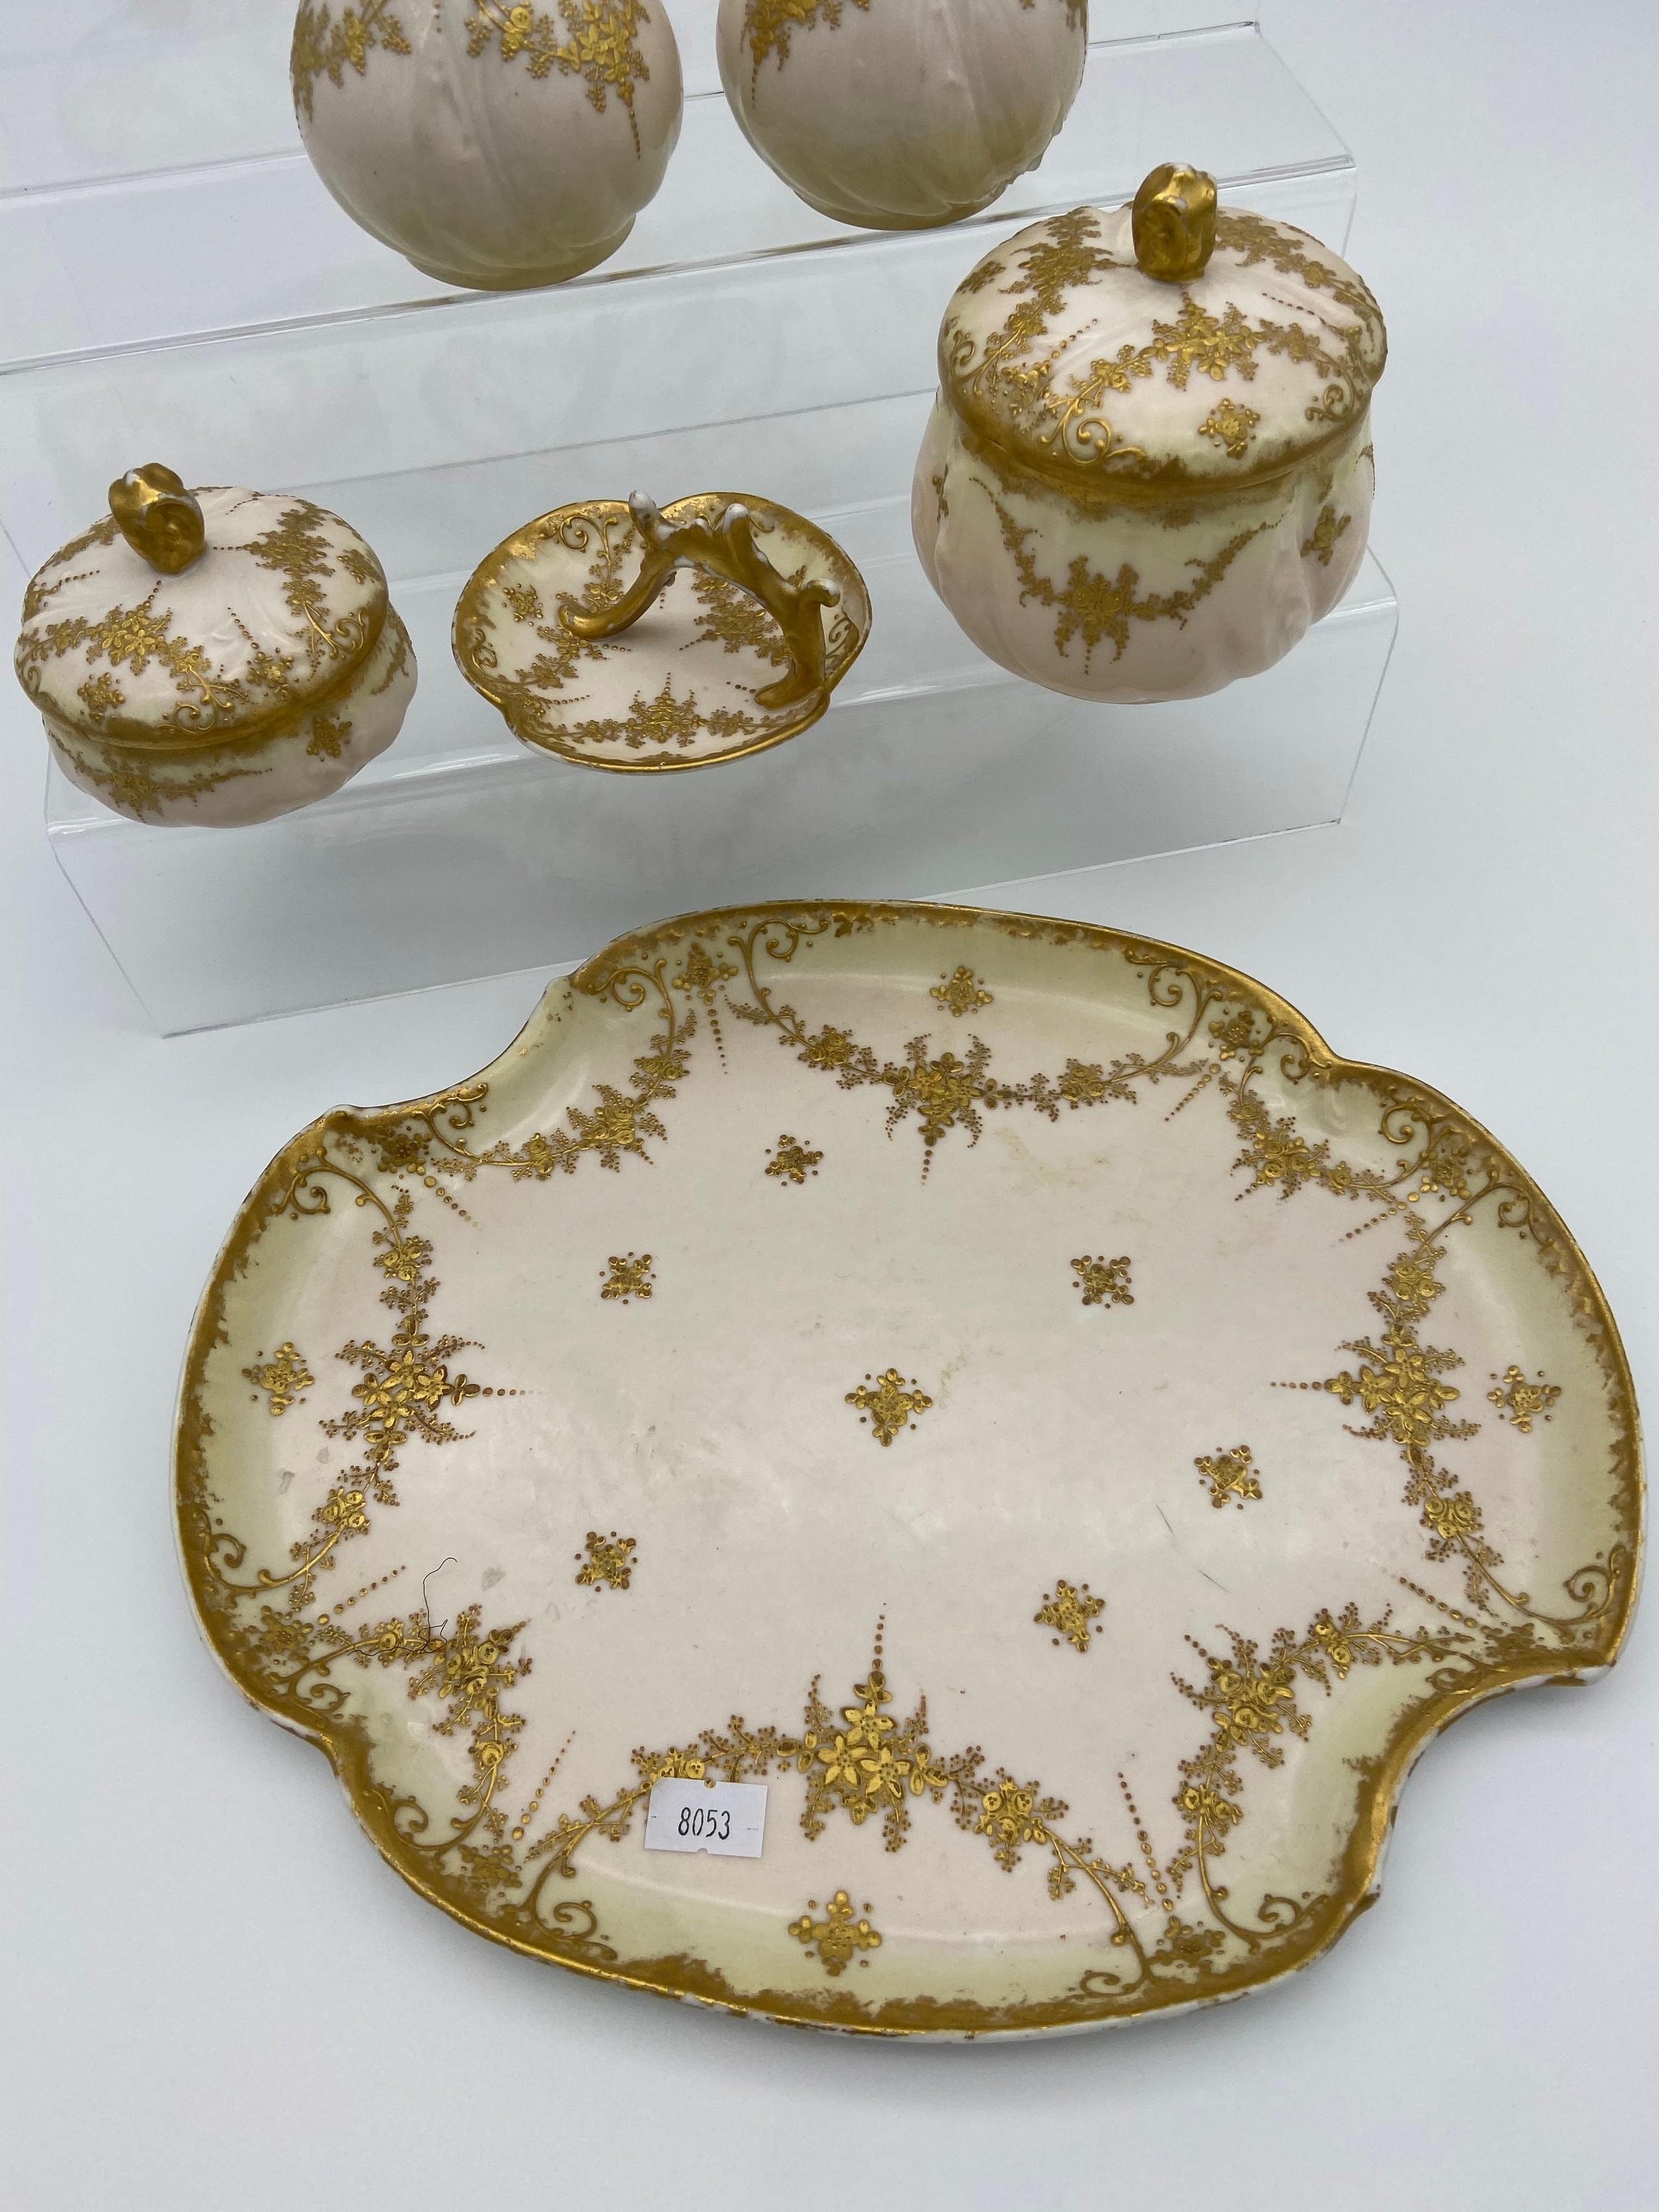 A Vintage French M Redon Limoges porcelain dressing table set. - Image 2 of 4